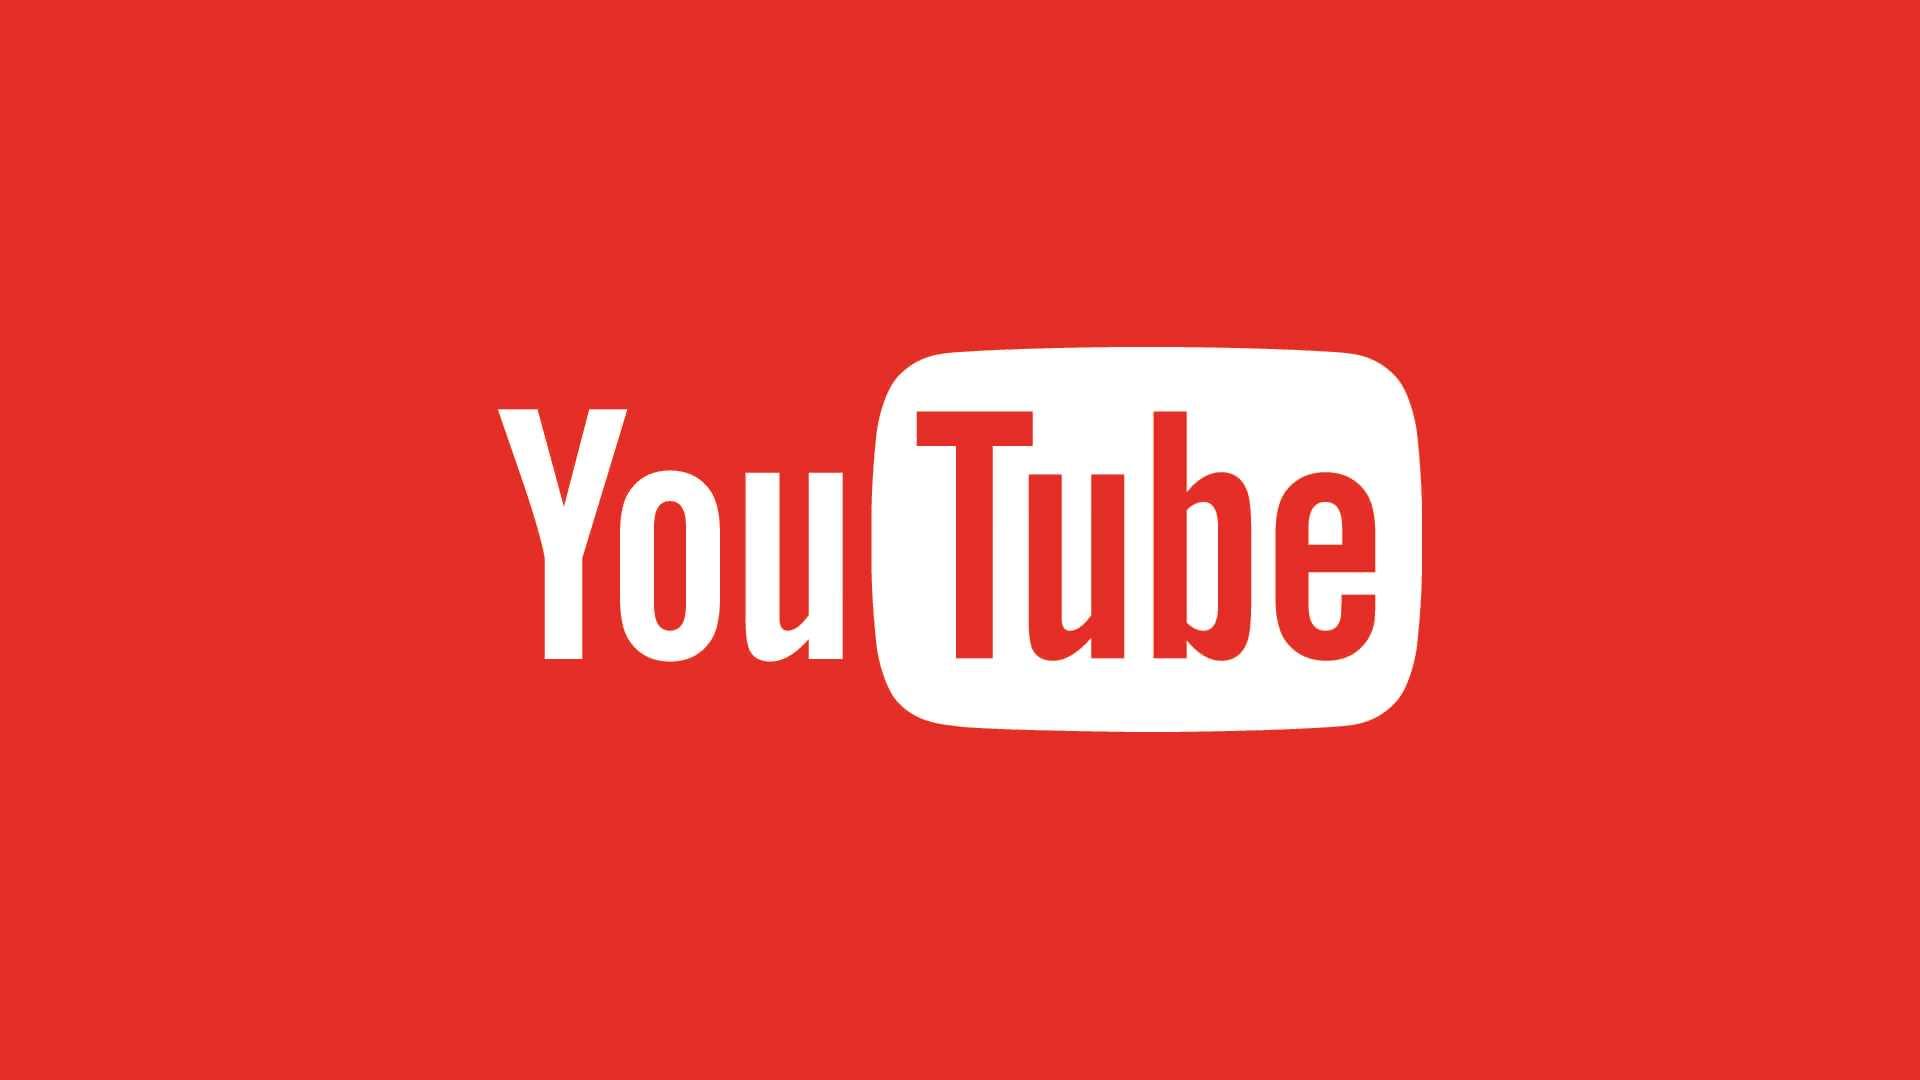 Ps4 youtube app 01